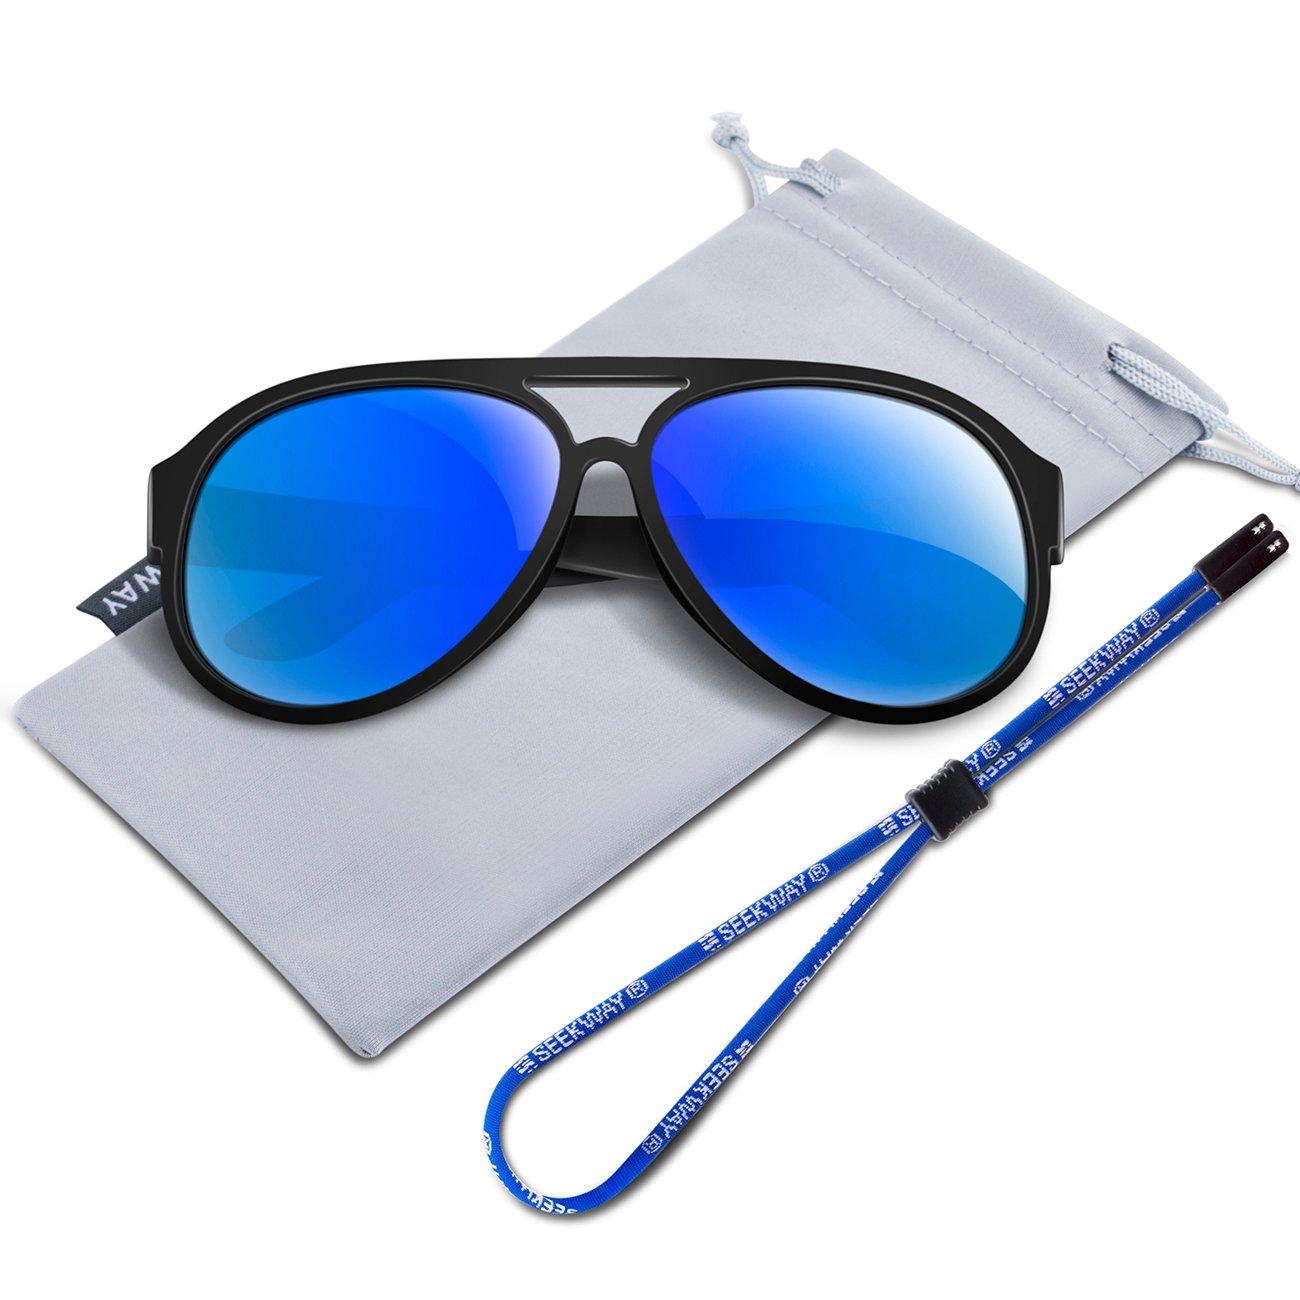 SEEKWAY Polarized Kids Sunglasses For Boys Girls Child Rubber Flexible frame Age 3+ SRK806 Blue Iced Lens)